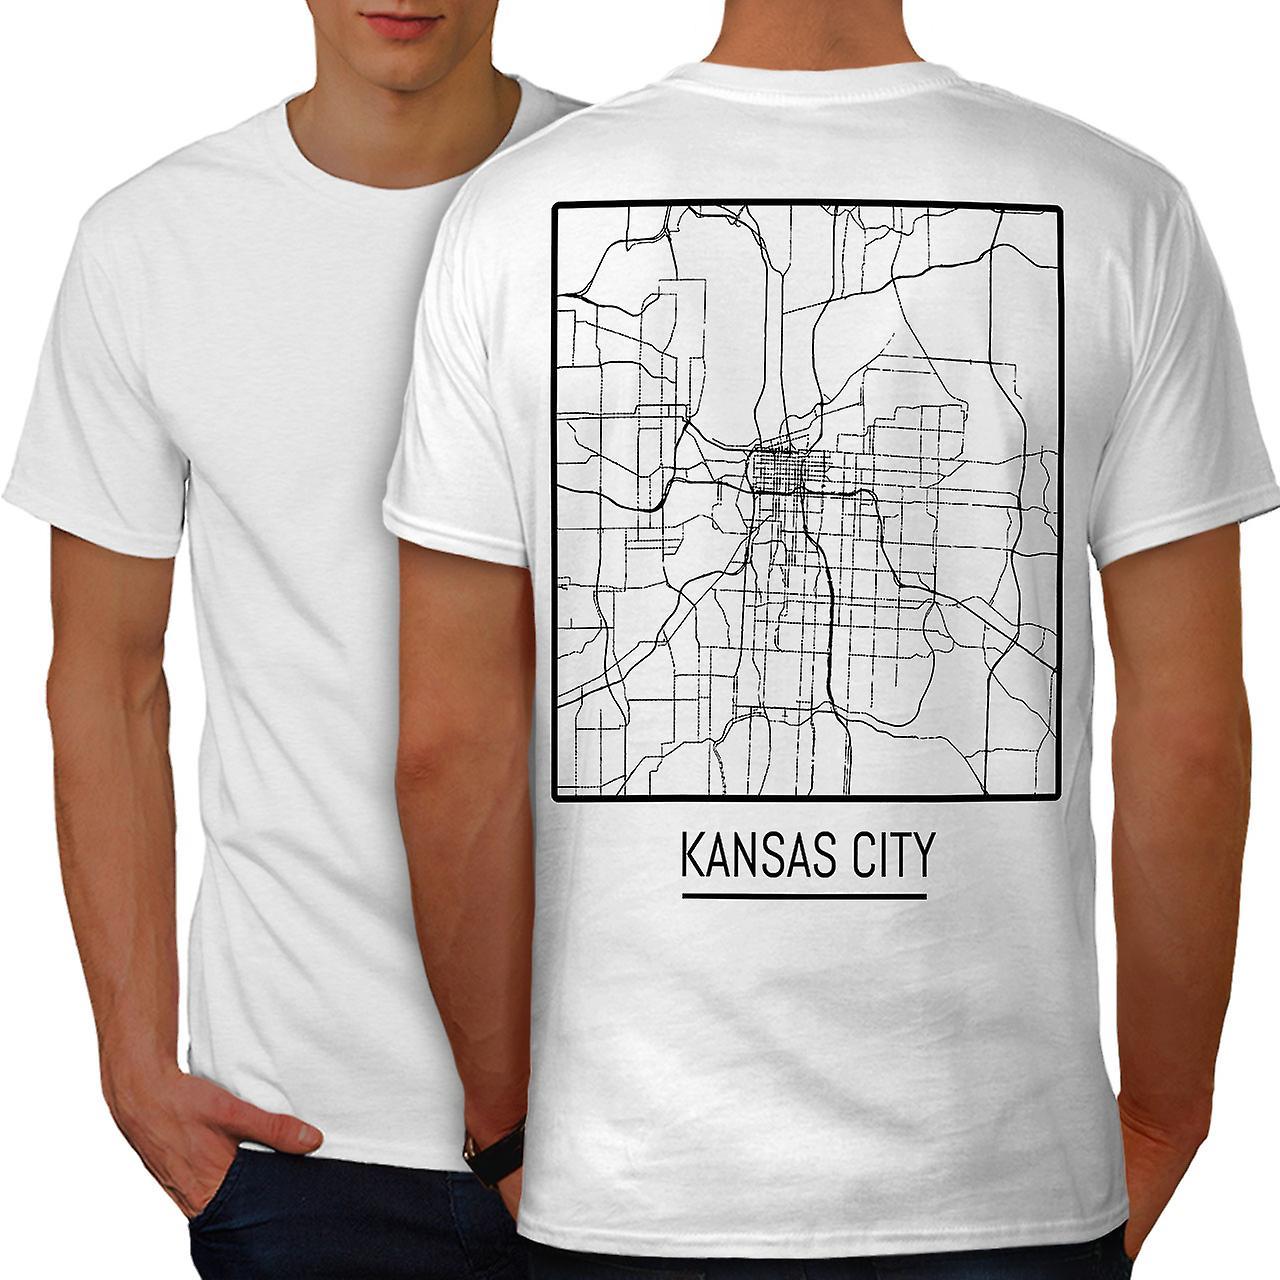 Kansas city out loud gay store